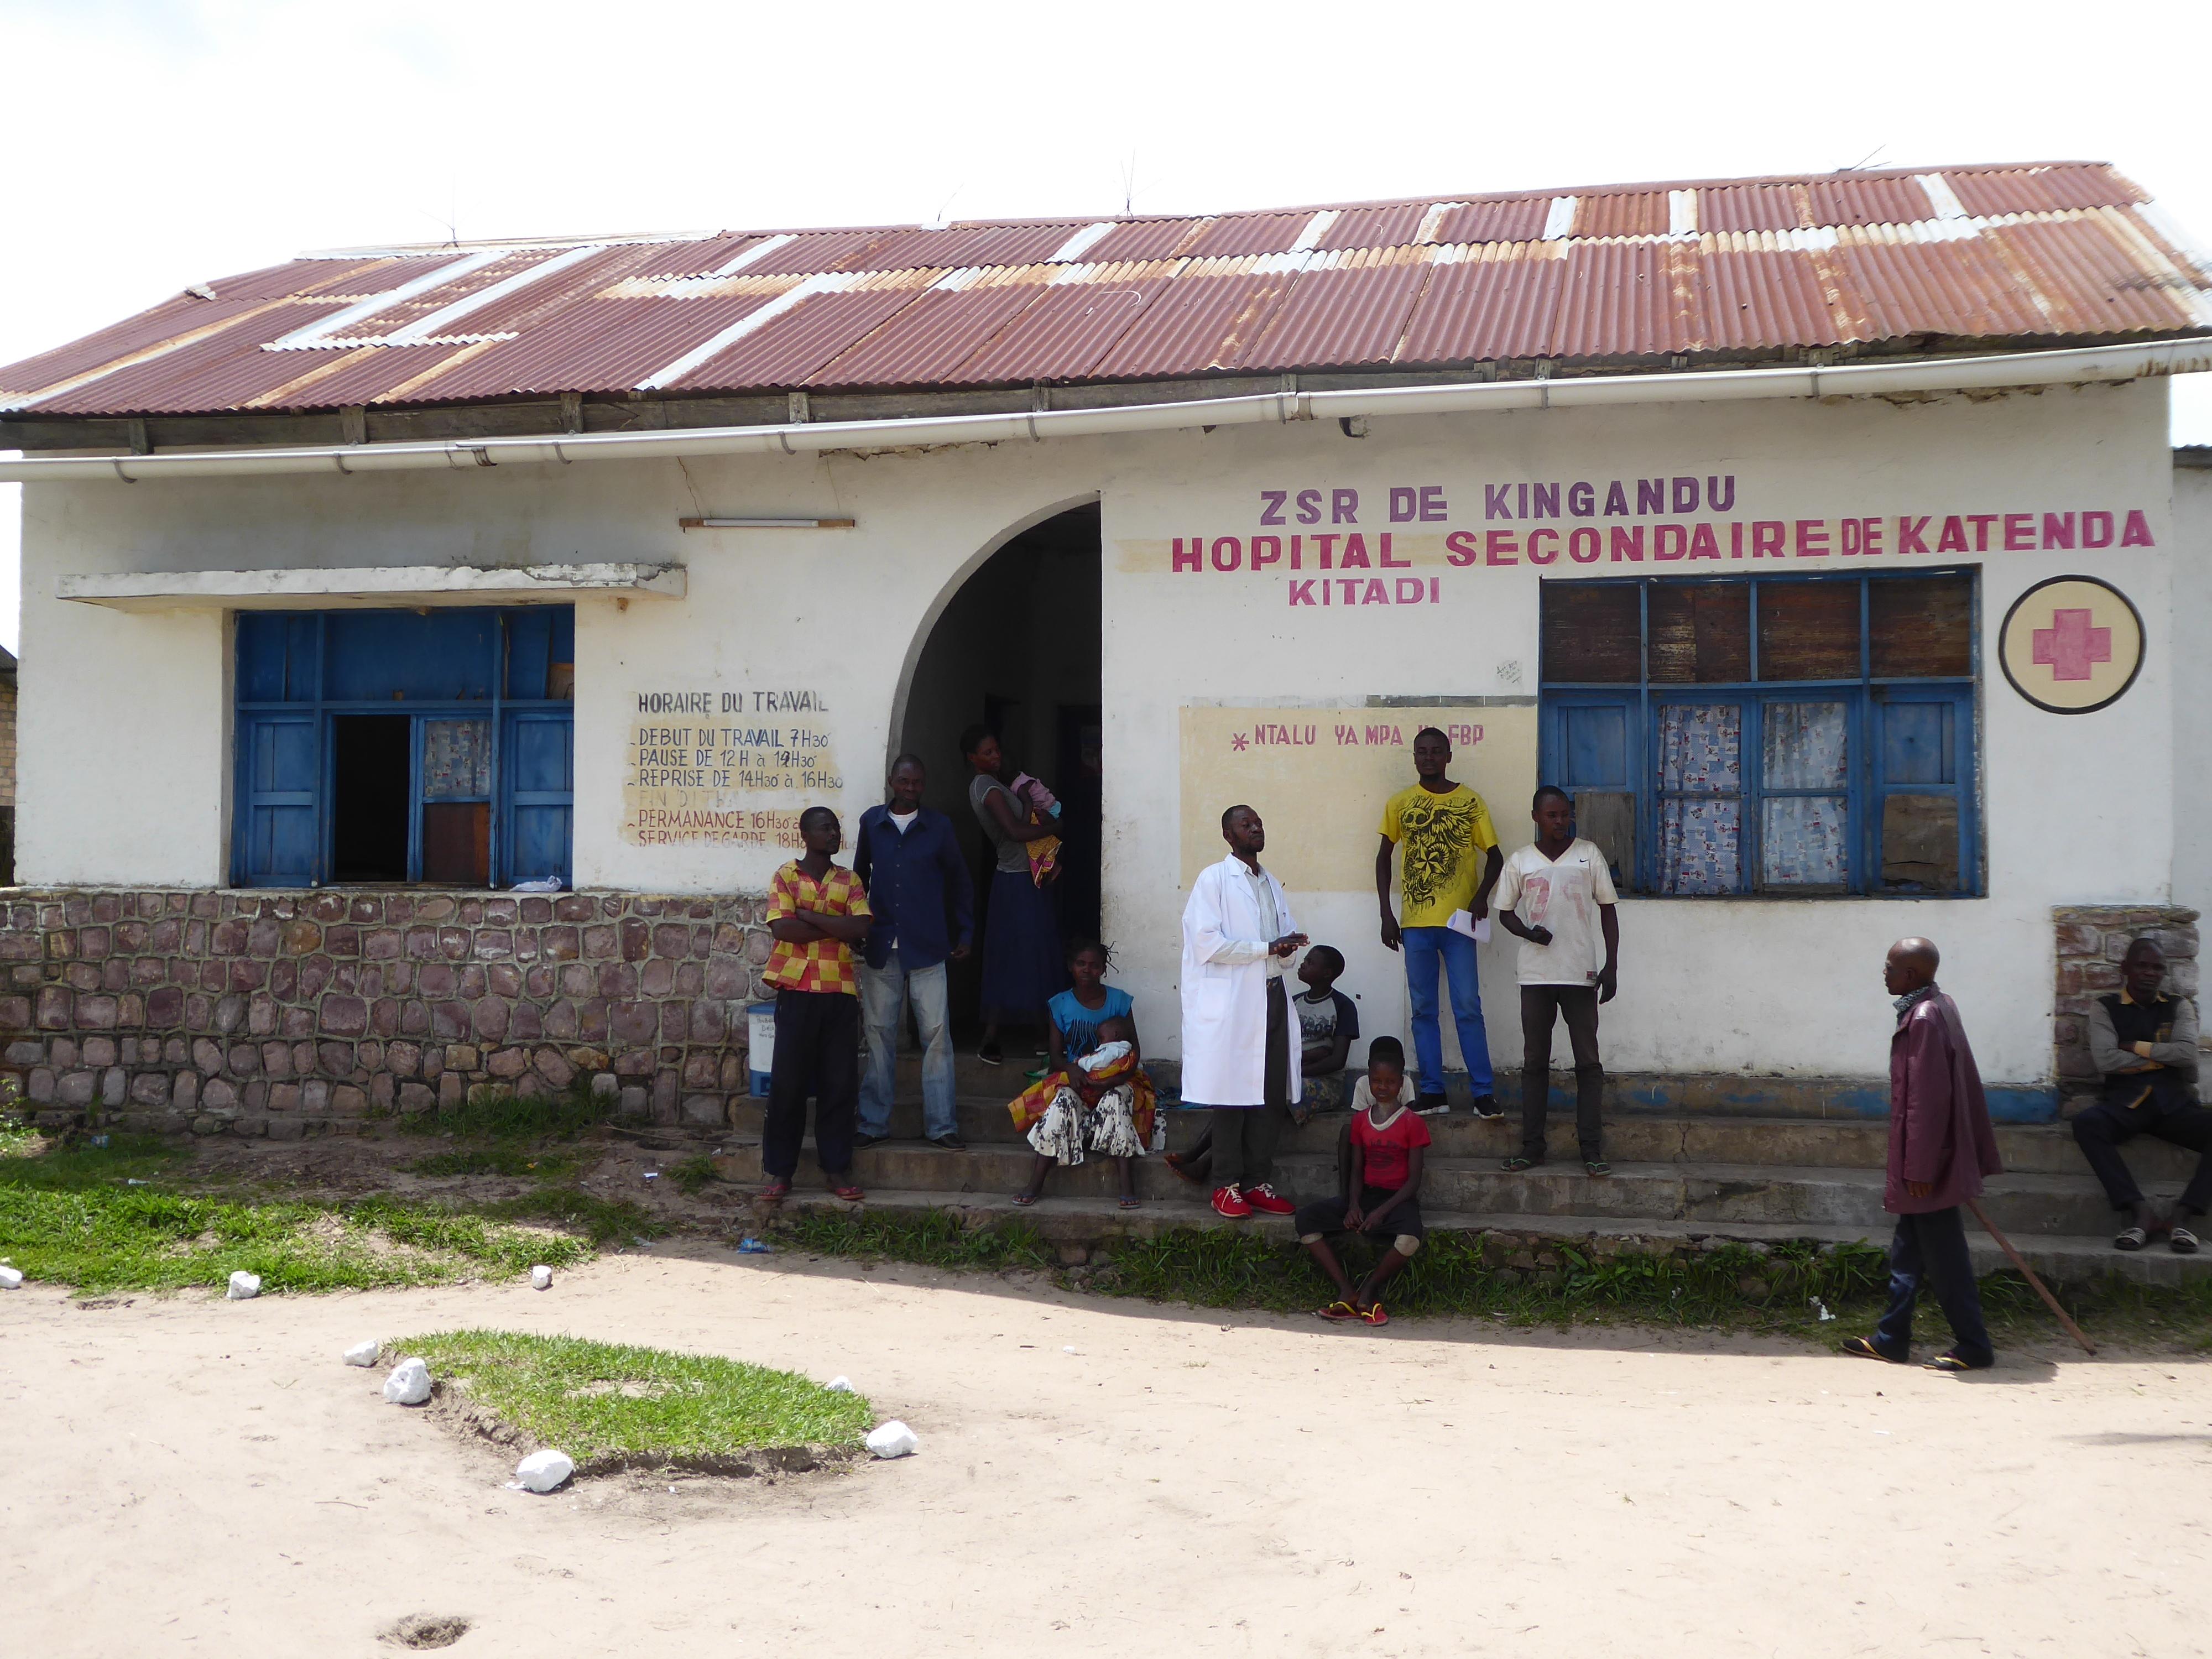 Kigandu health center in DR Congo